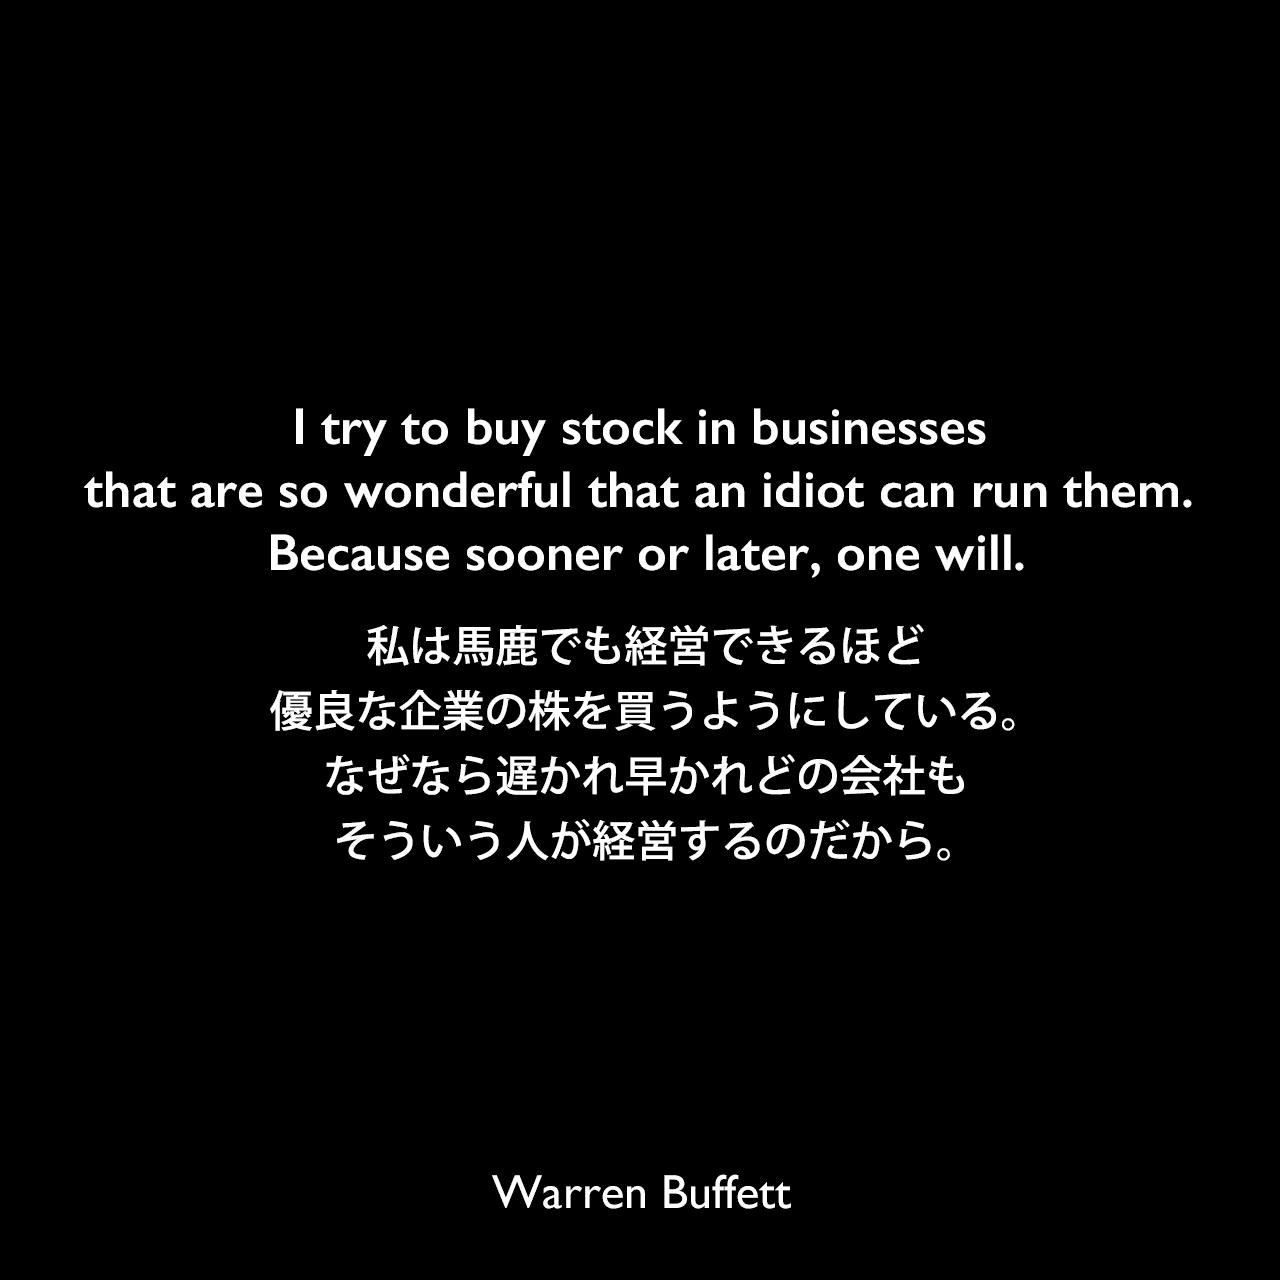 I try to buy stock in businesses that are so wonderful that an idiot can run them. Because sooner or later, one will.私は馬鹿でも経営できるほど優良な企業の株を買うようにしている。なぜなら遅かれ早かれどの会社もそういう人が経営するのだから。Warren Buffett